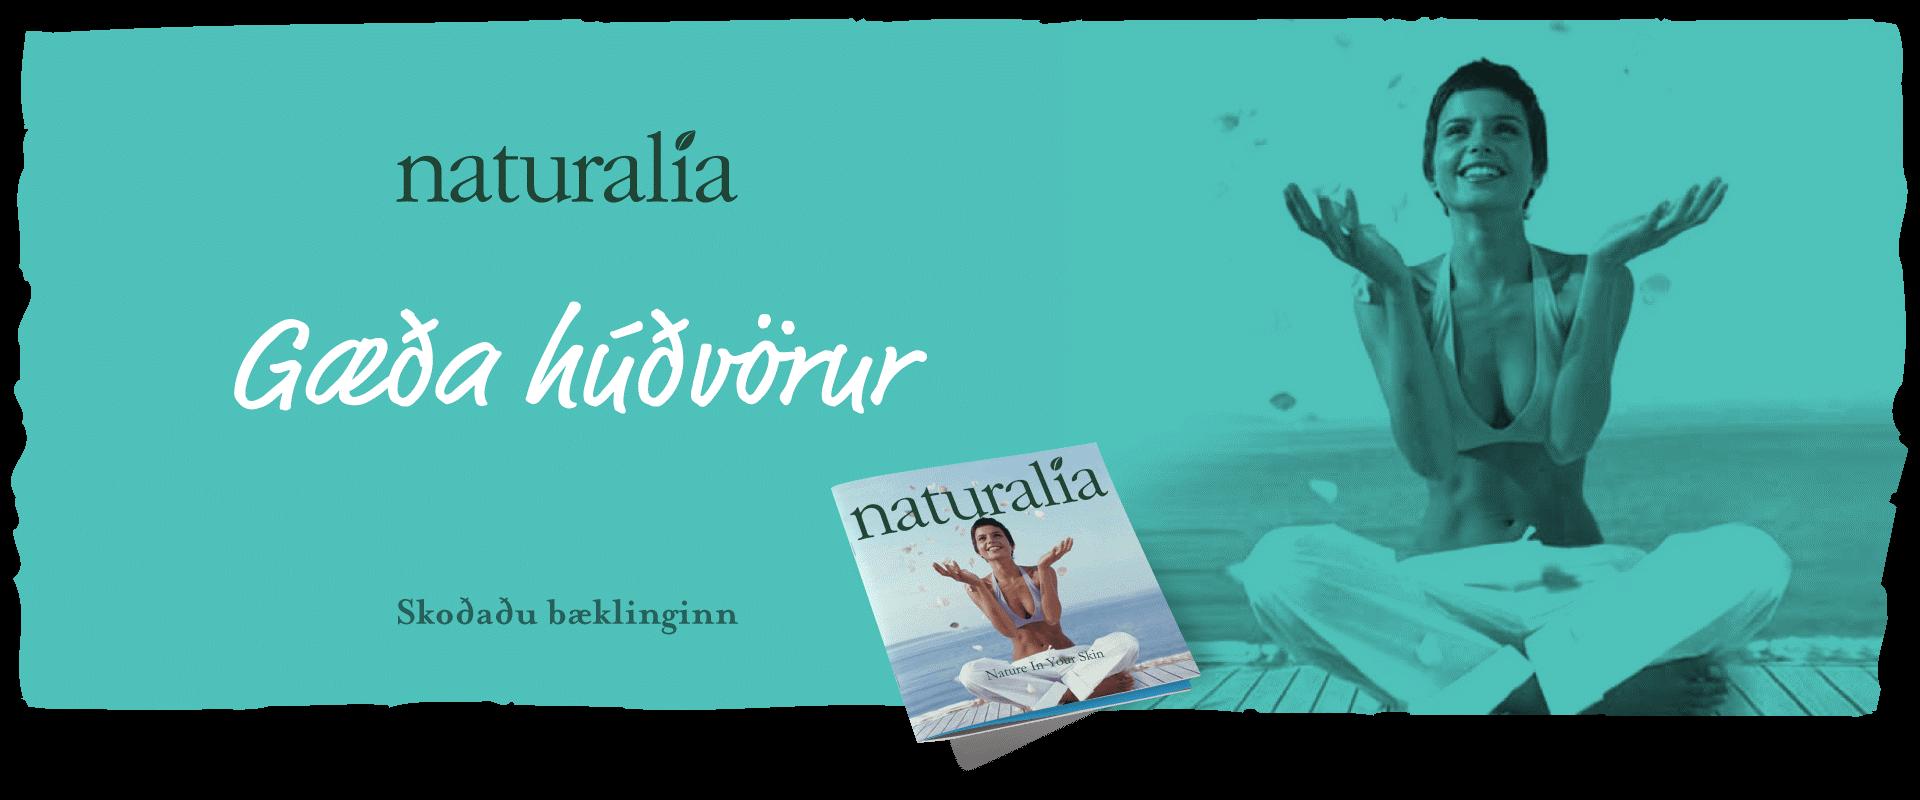 Naturalia_banner_2